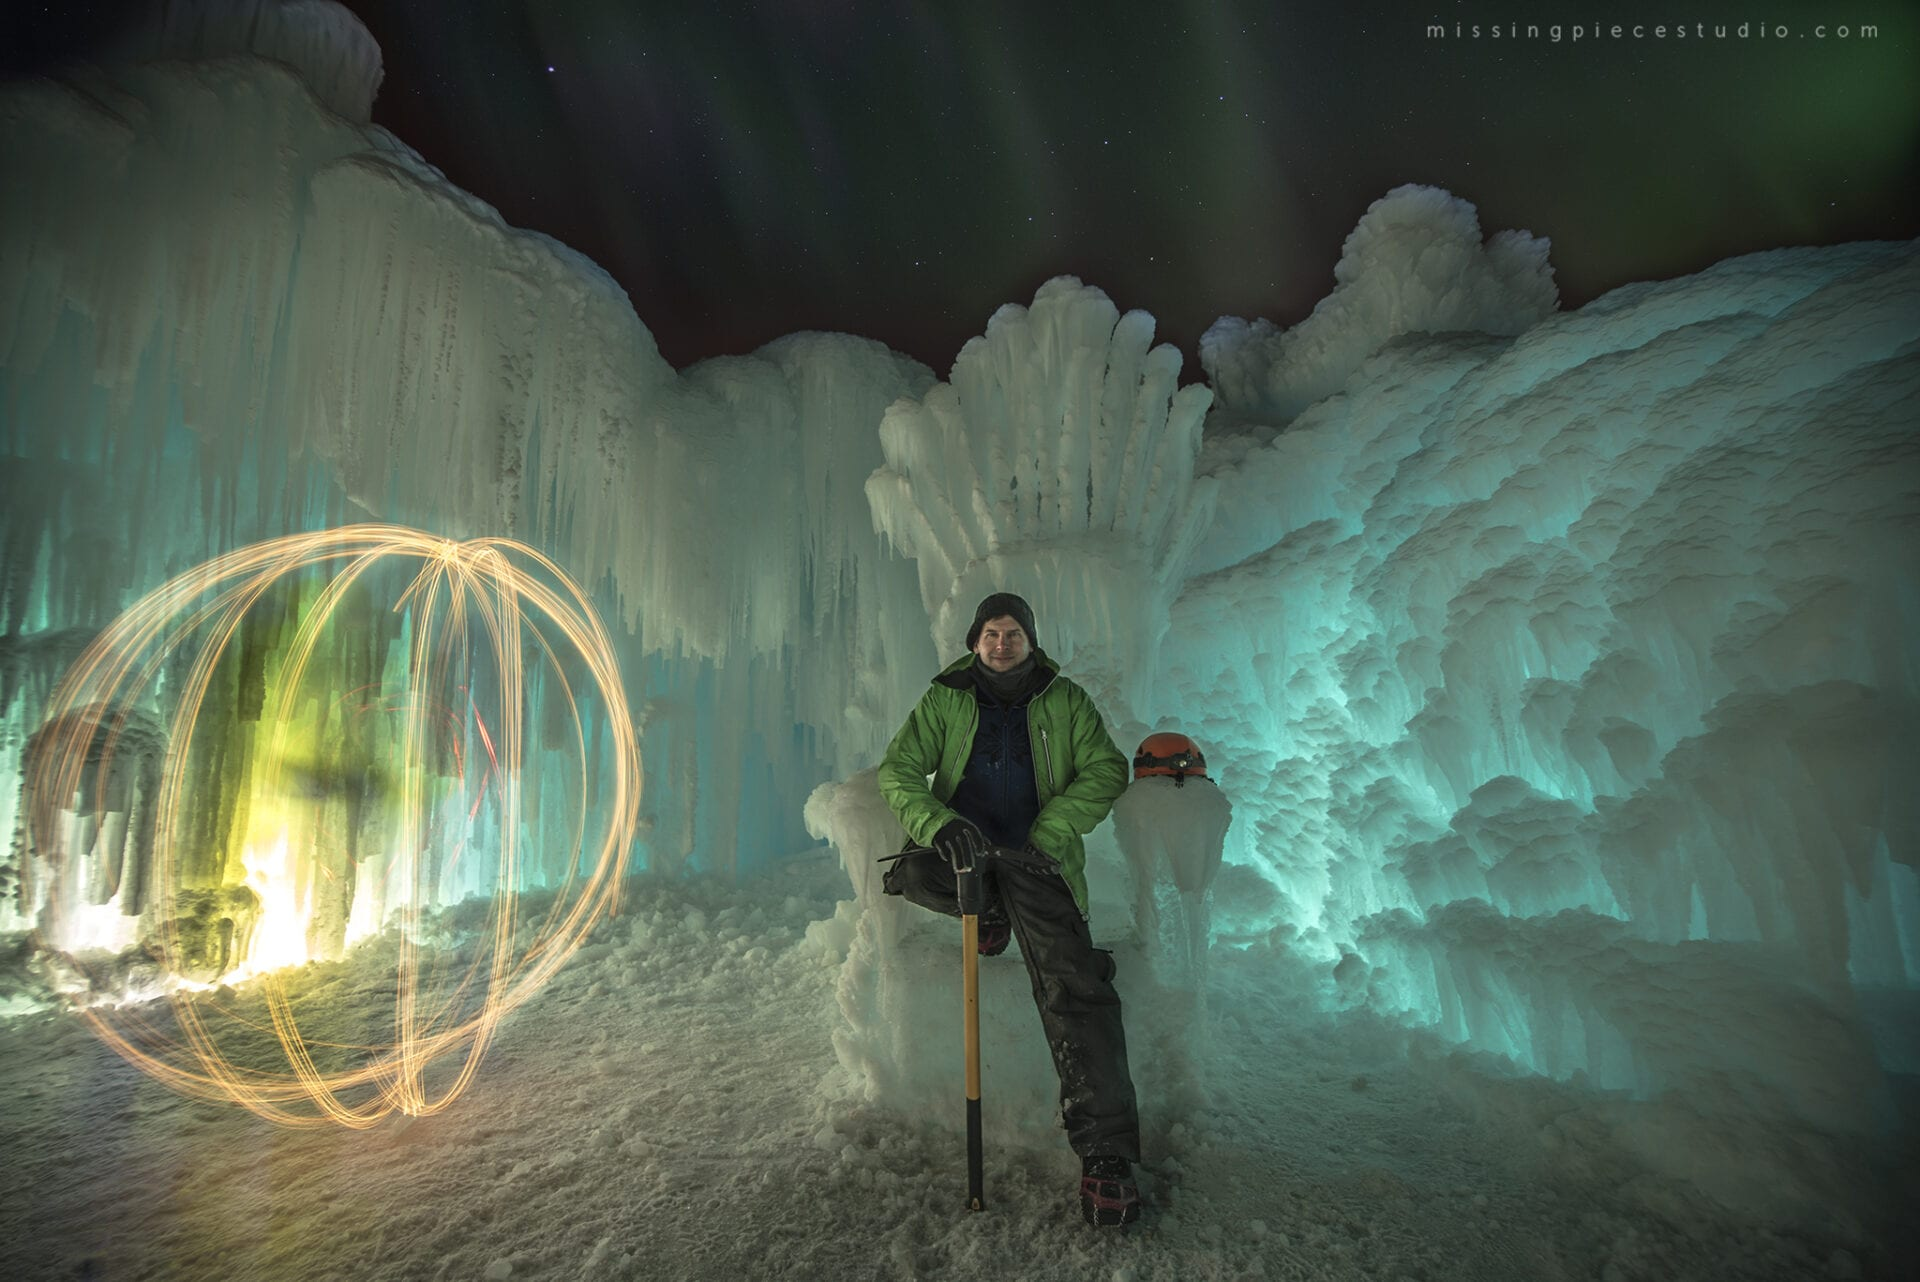 Ice Castles Edmonton Alberta Winter Visit Hawrelak Park-night low light